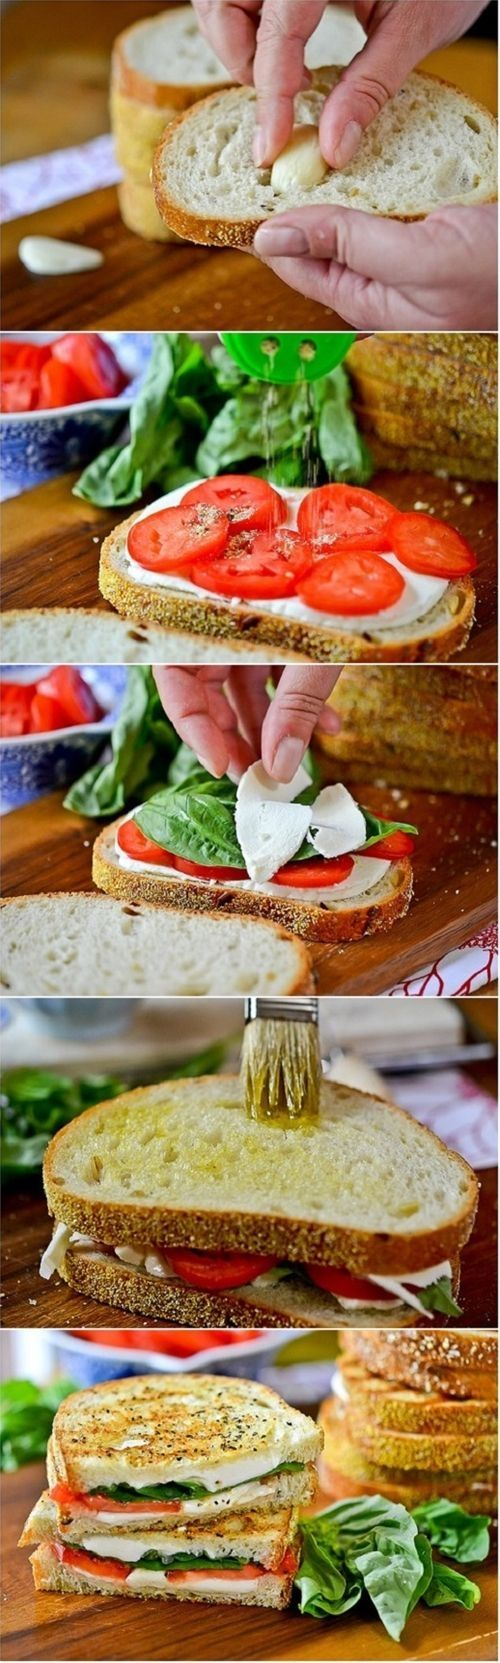 Margherita Grilled Cheese Sandwich by batjas88